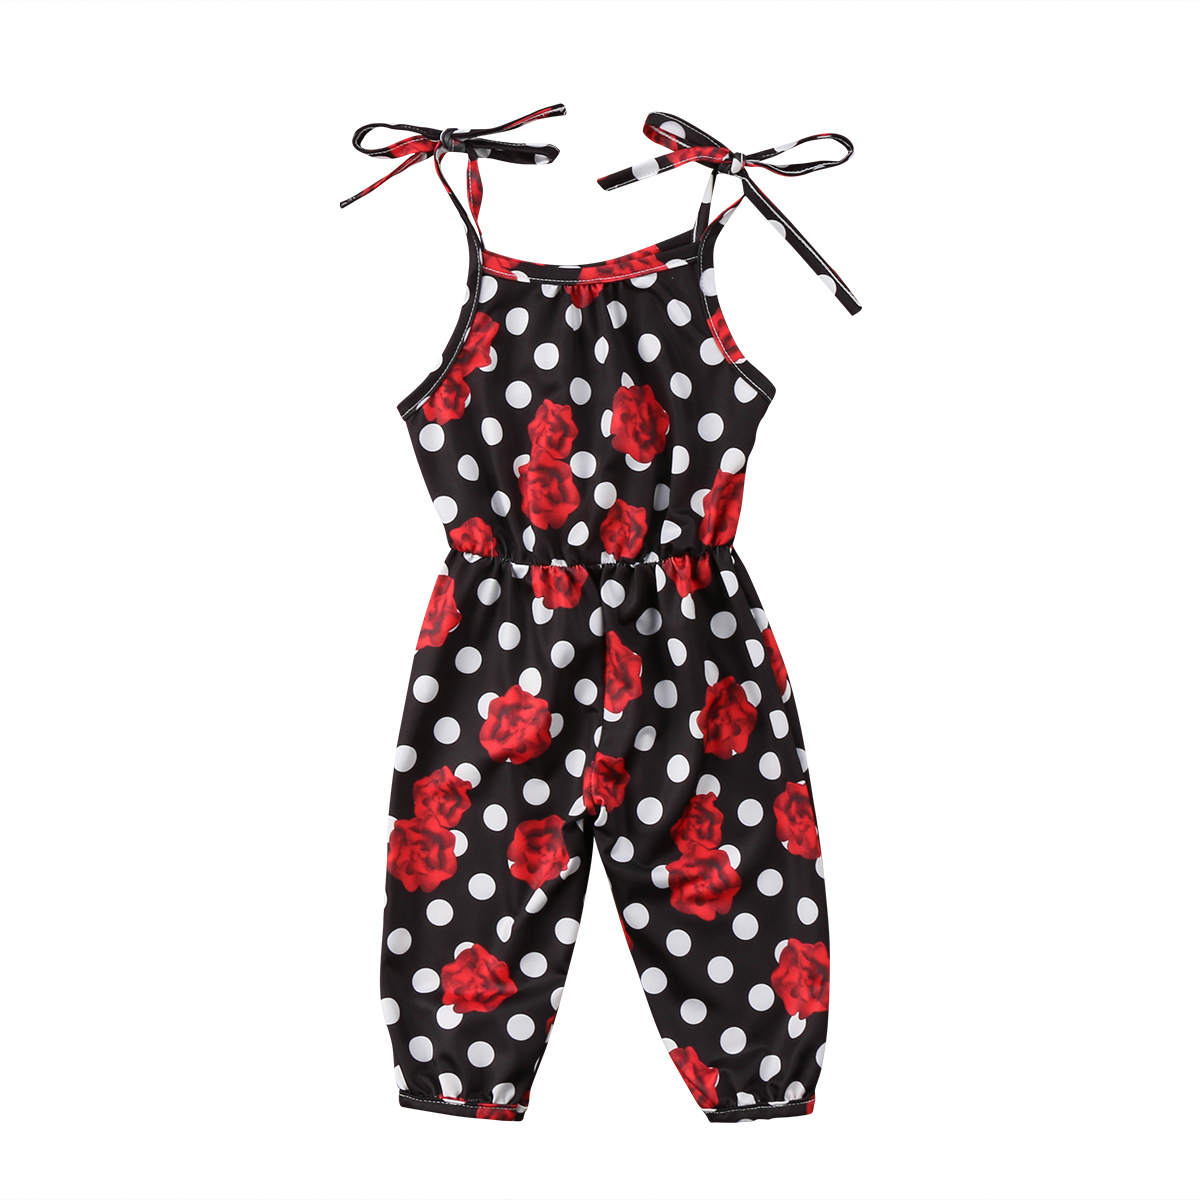 Infant Toddler Rompers Baby Girls Strap Jumpsuit Rompers Rose Floral Tie Summer Clothes Floral Romper Sunsuit